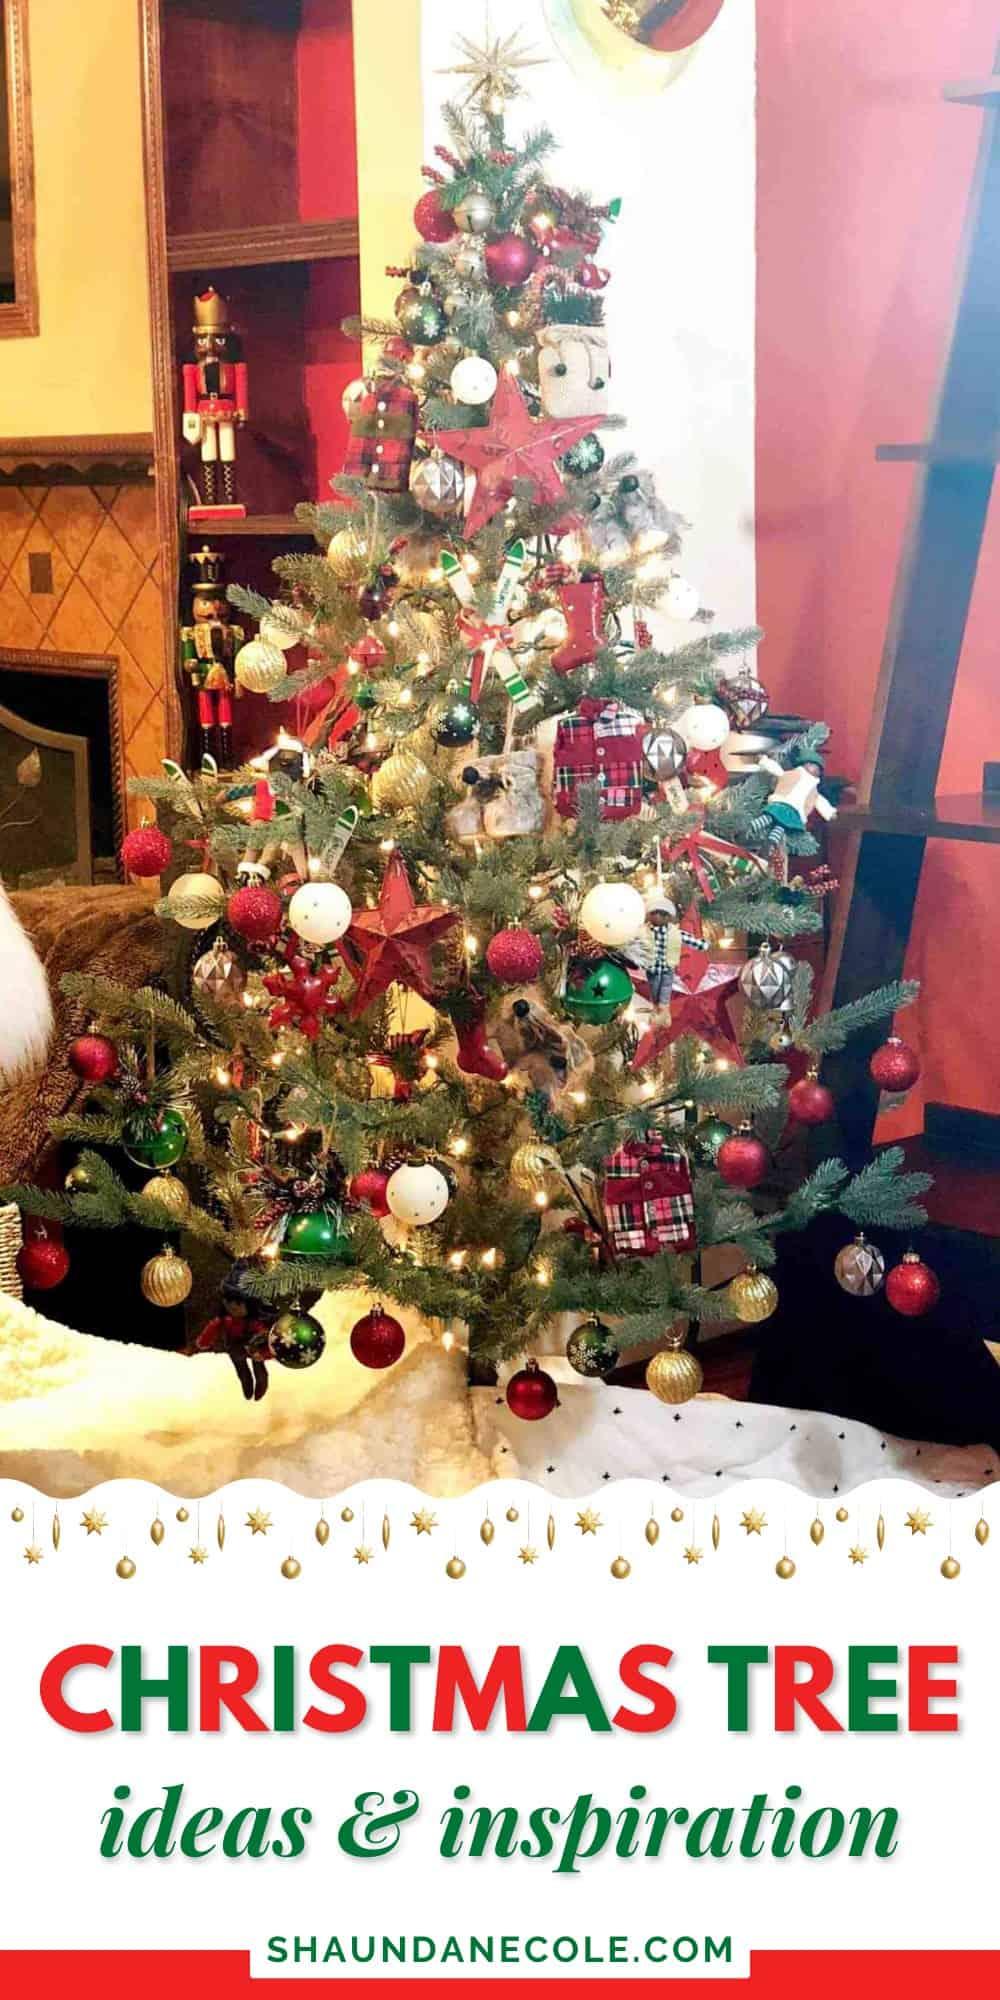 Christmas Trees Ideas & Inspiration